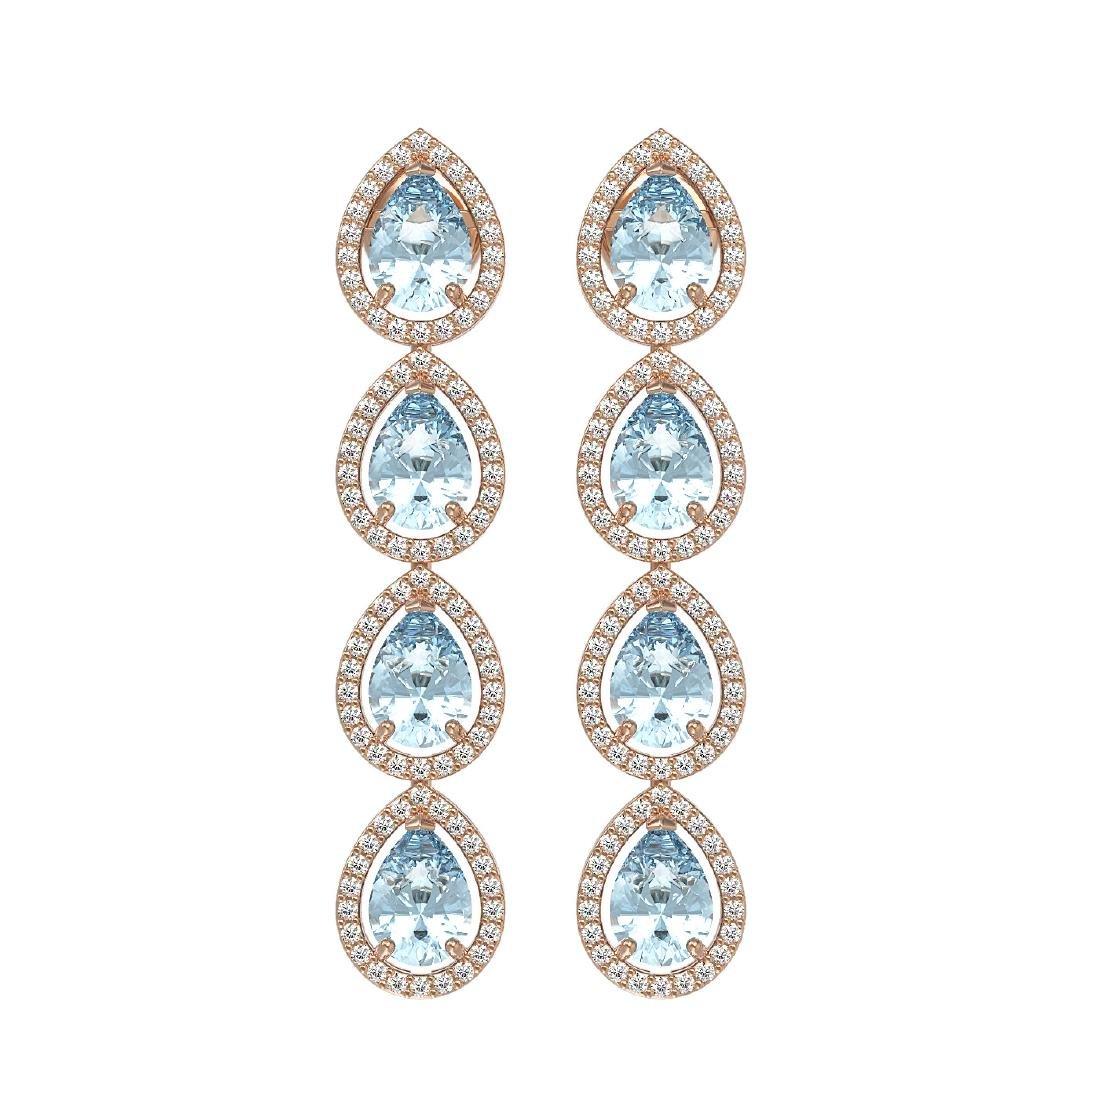 7.81 CTW Sky Topaz & Diamond Halo Earrings 10K Rose